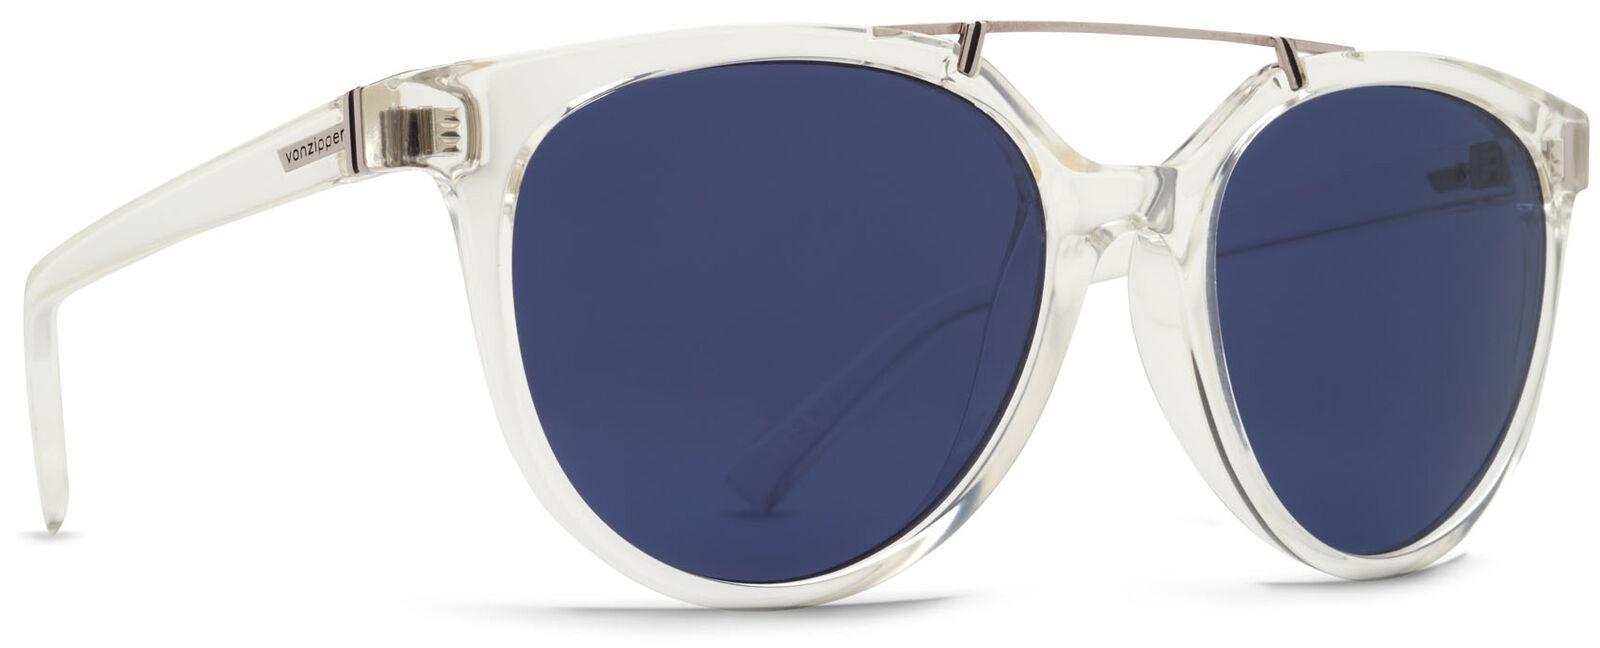 Von Zipper Hitsville Navy Lens Sunglasses, Crystal Gloss